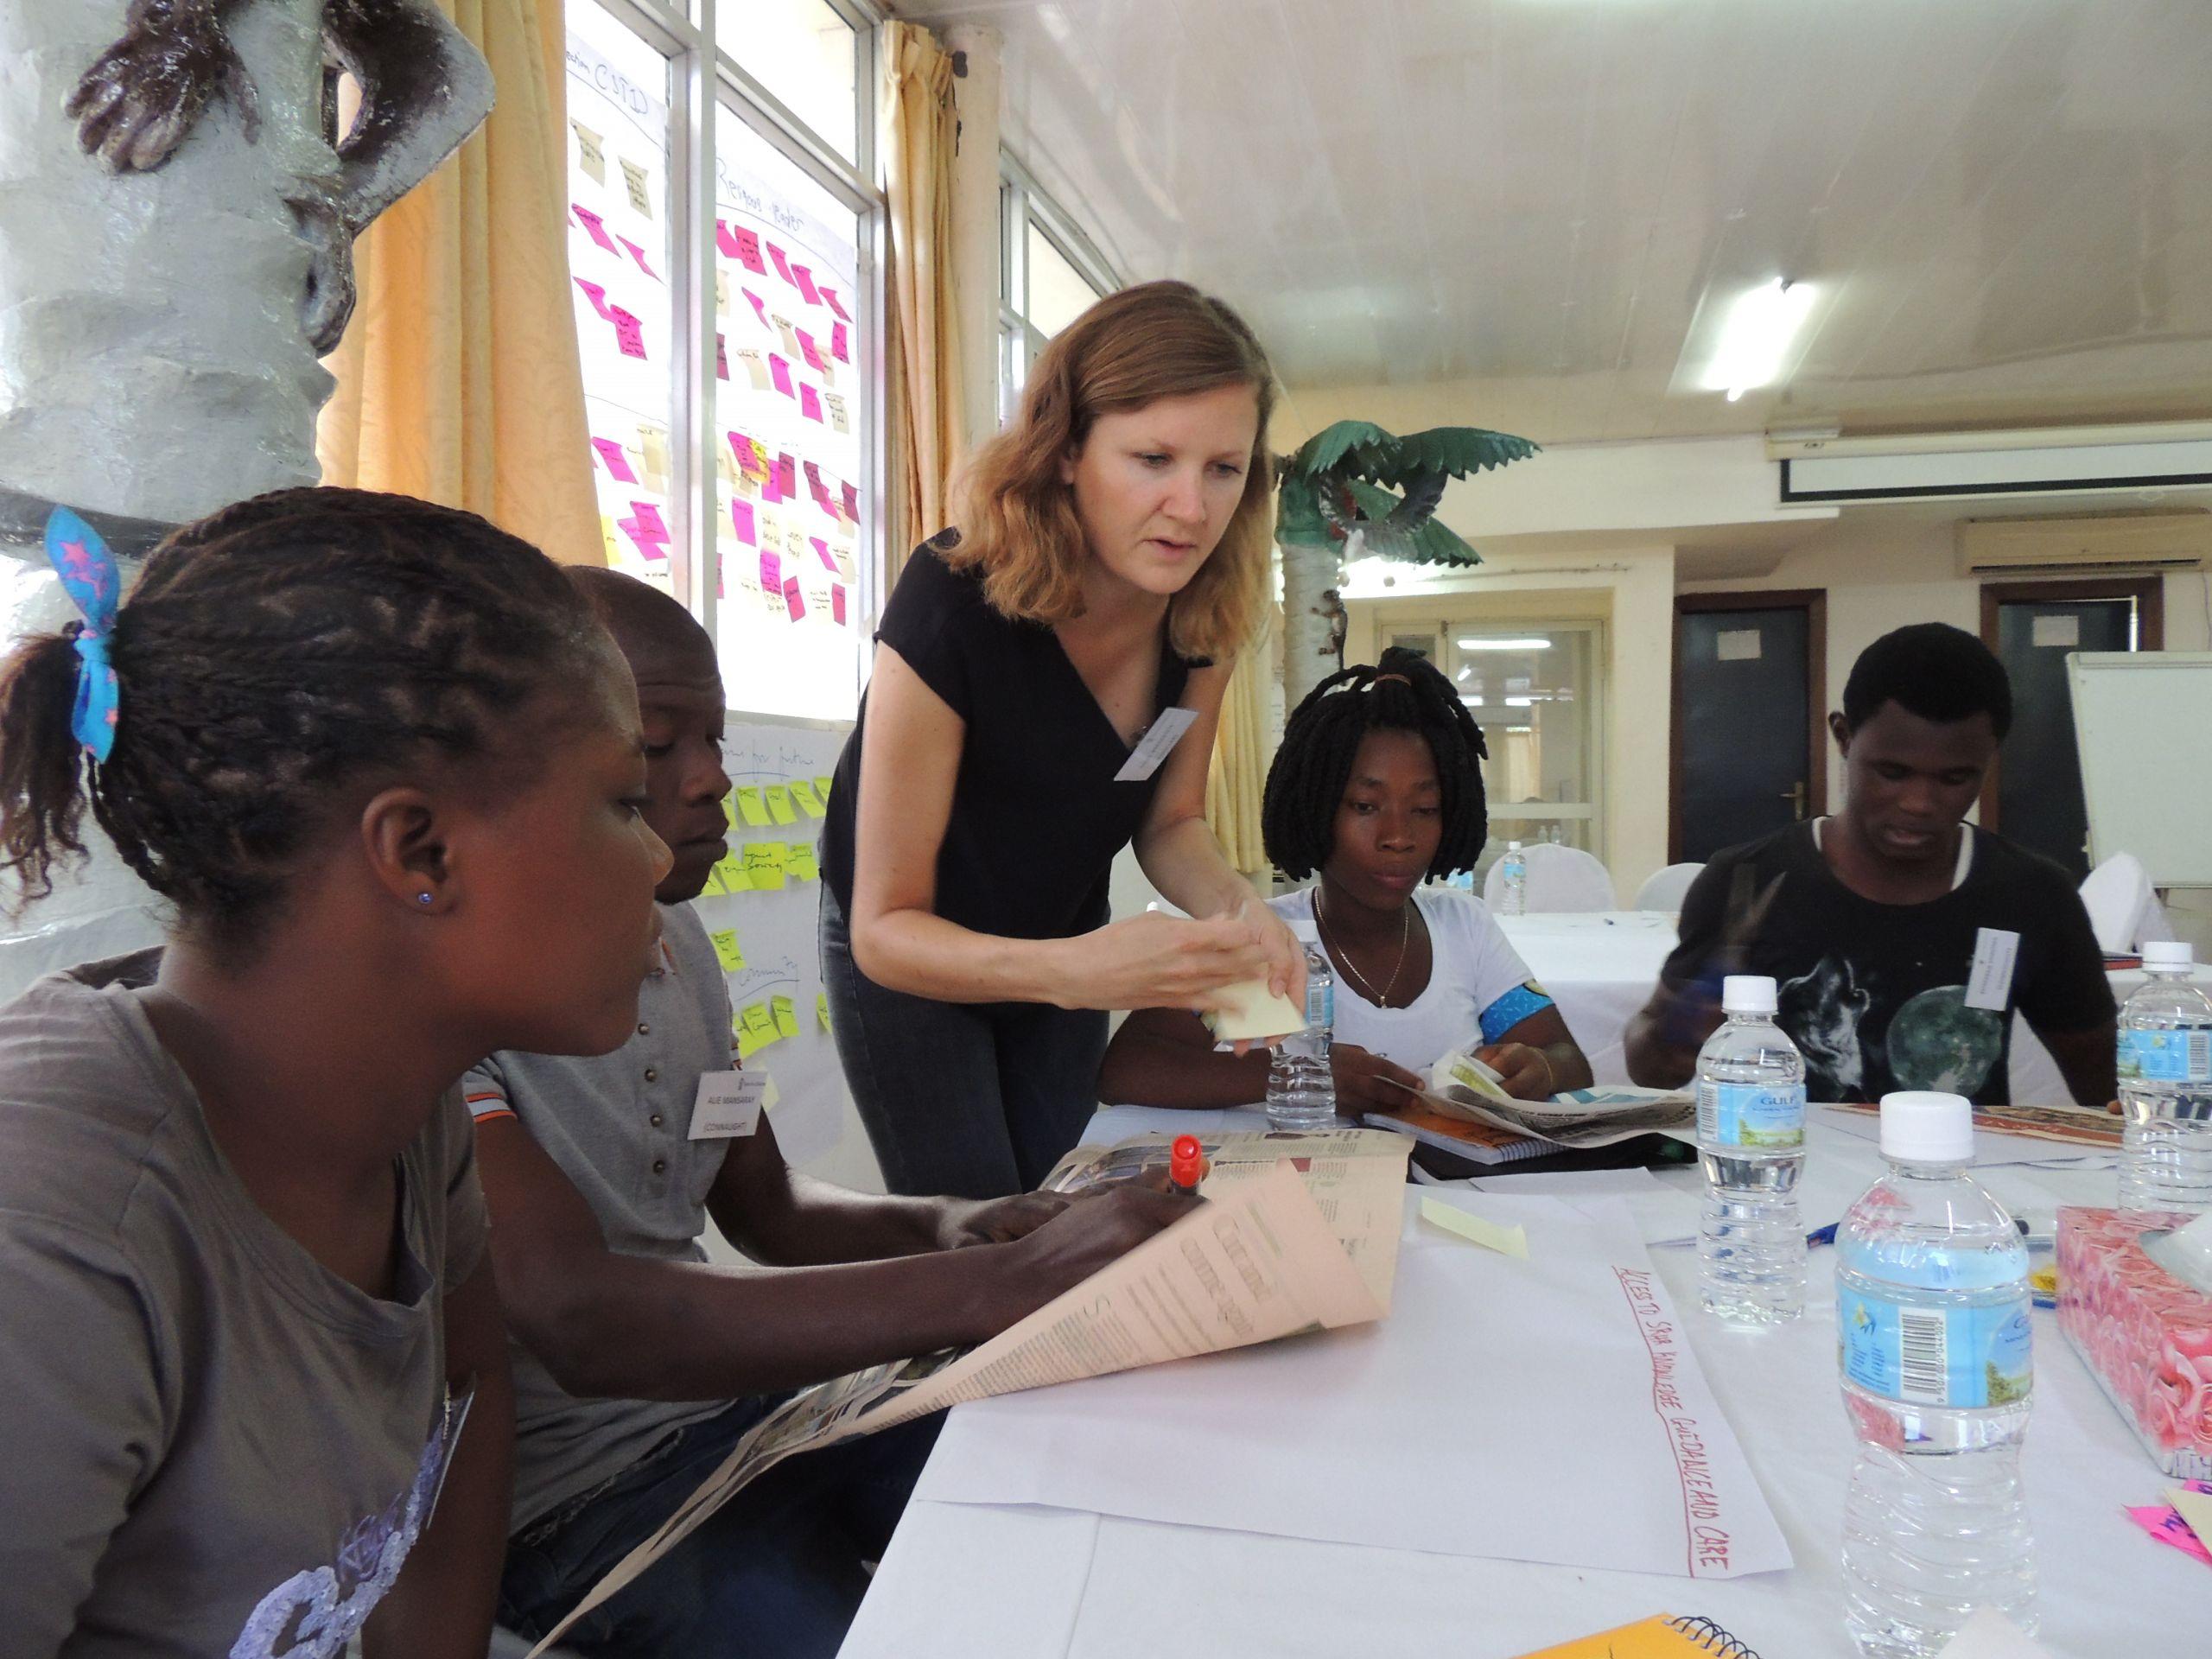 Danish woman and Africa children